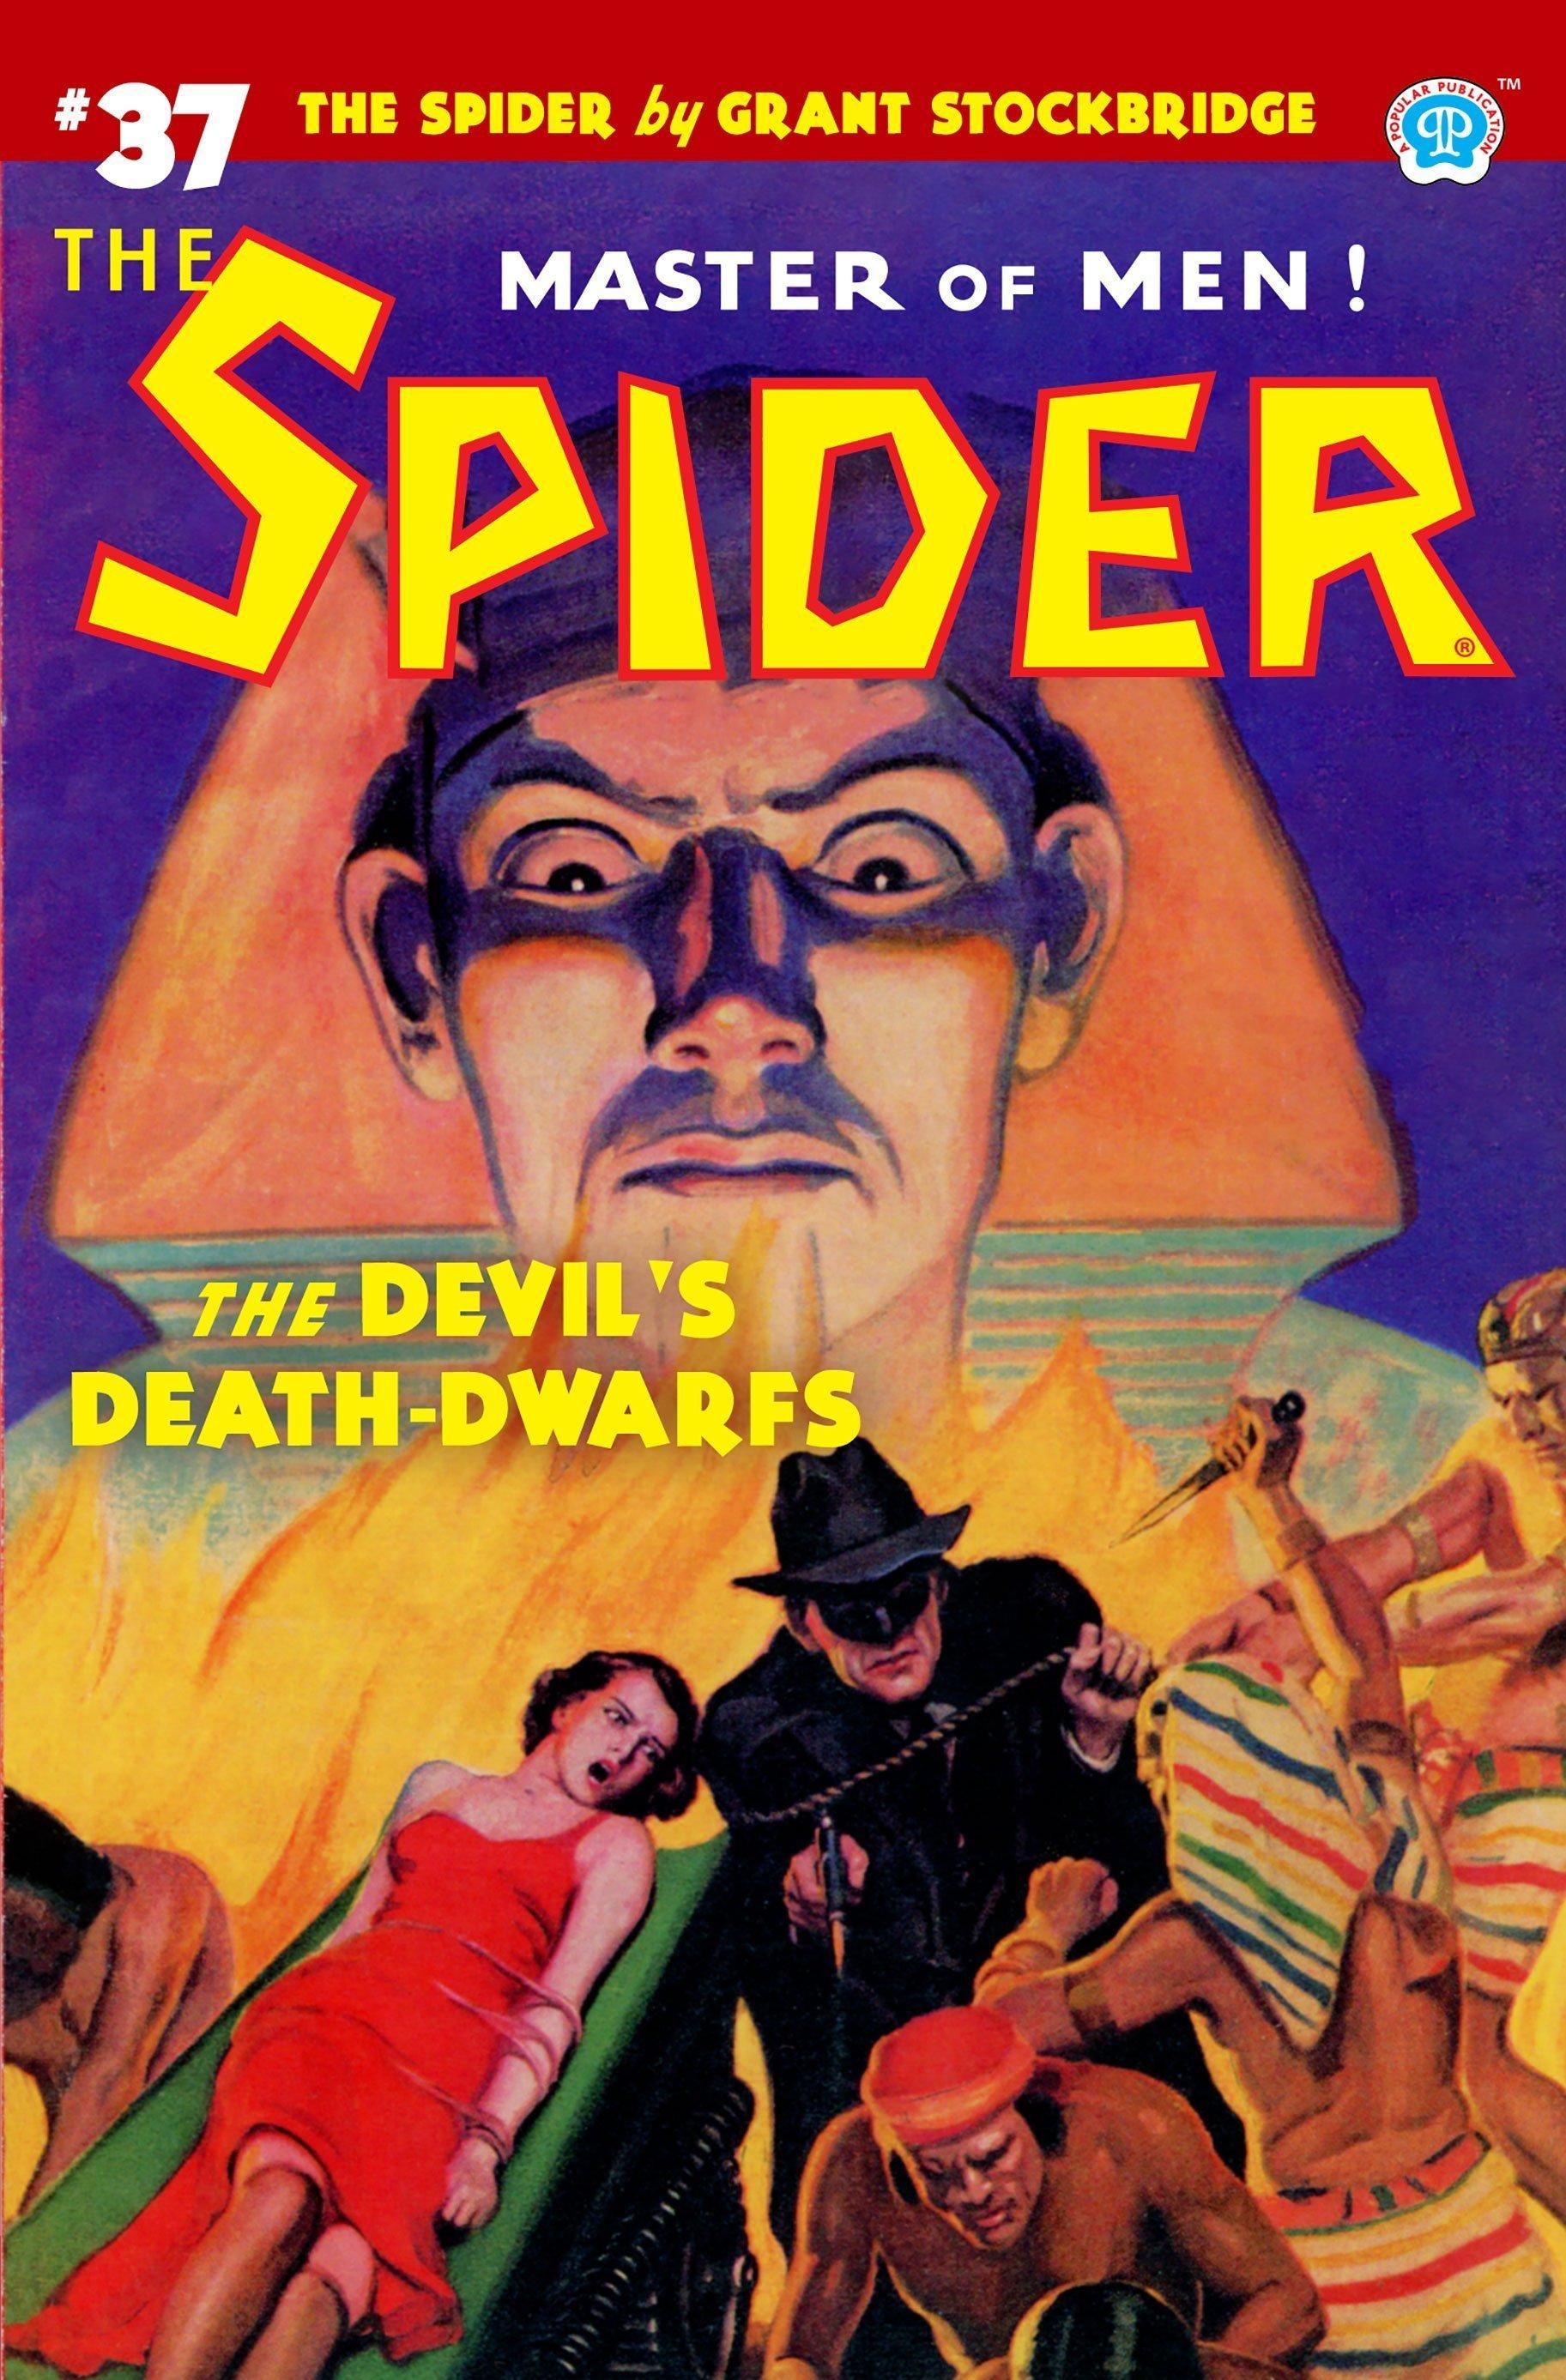 The Spider #37: The Devil's Death-Dwarfs